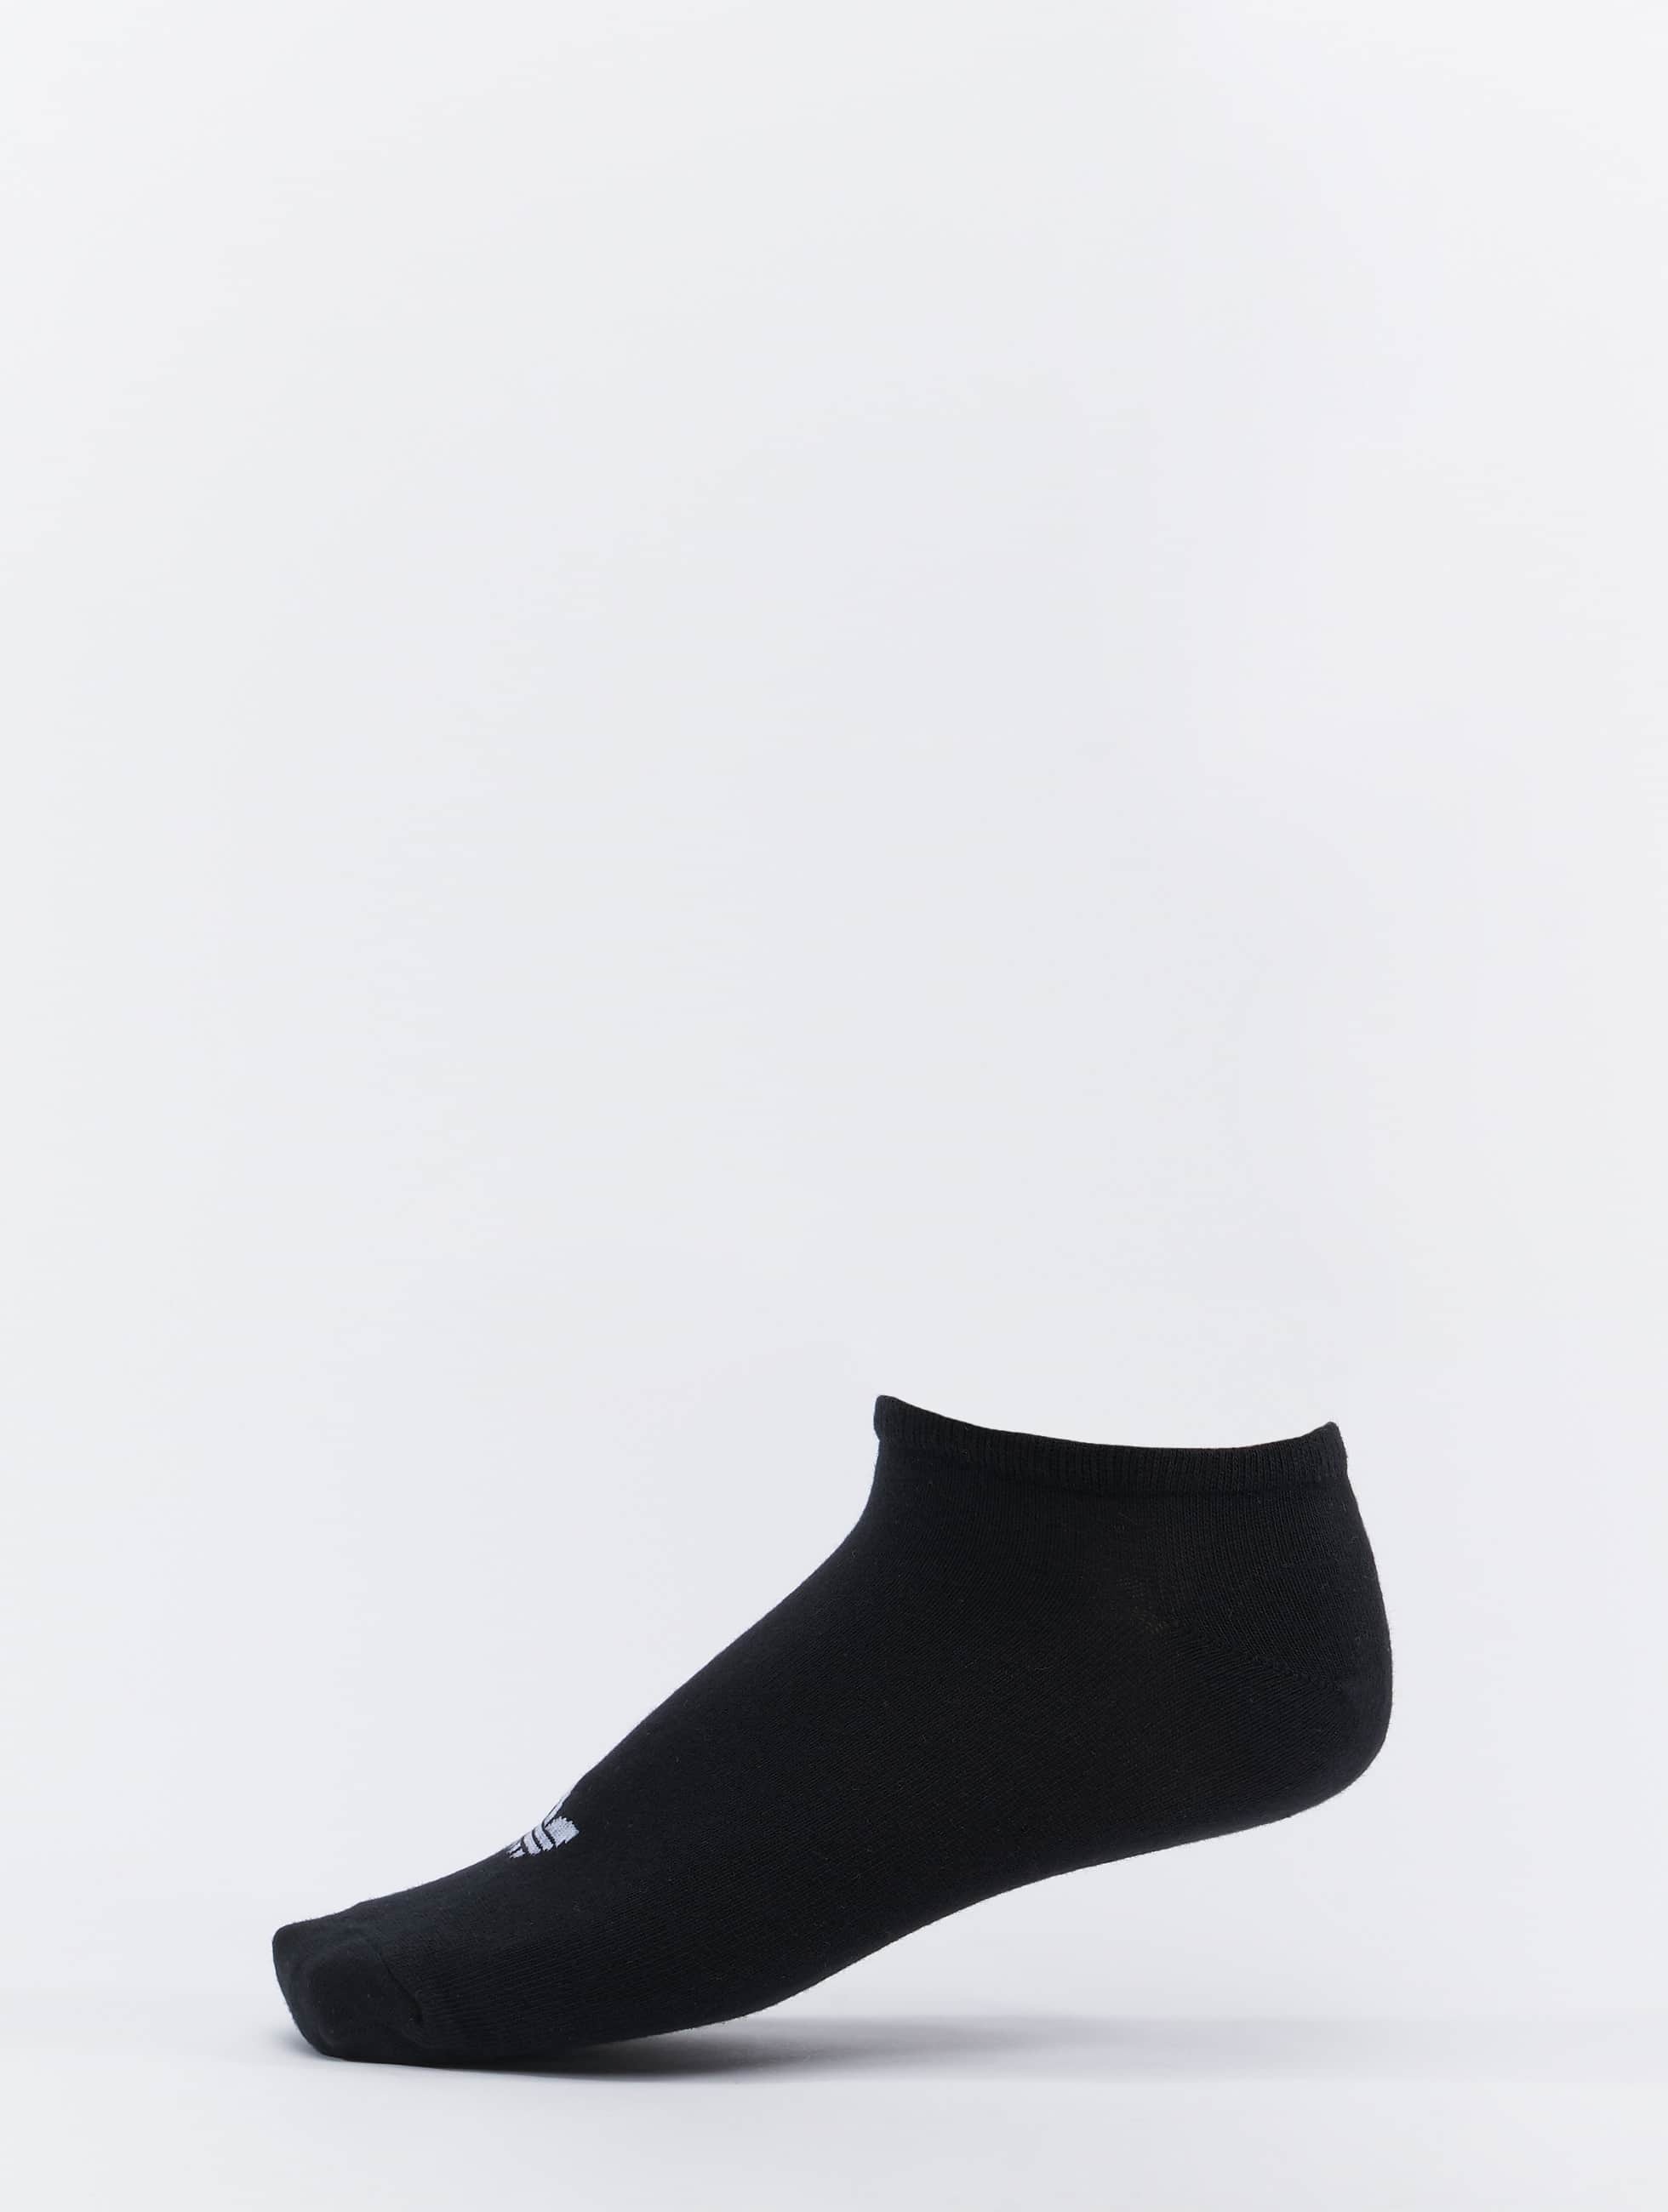 adidas originals socken s20274 in schwarz 177959. Black Bedroom Furniture Sets. Home Design Ideas